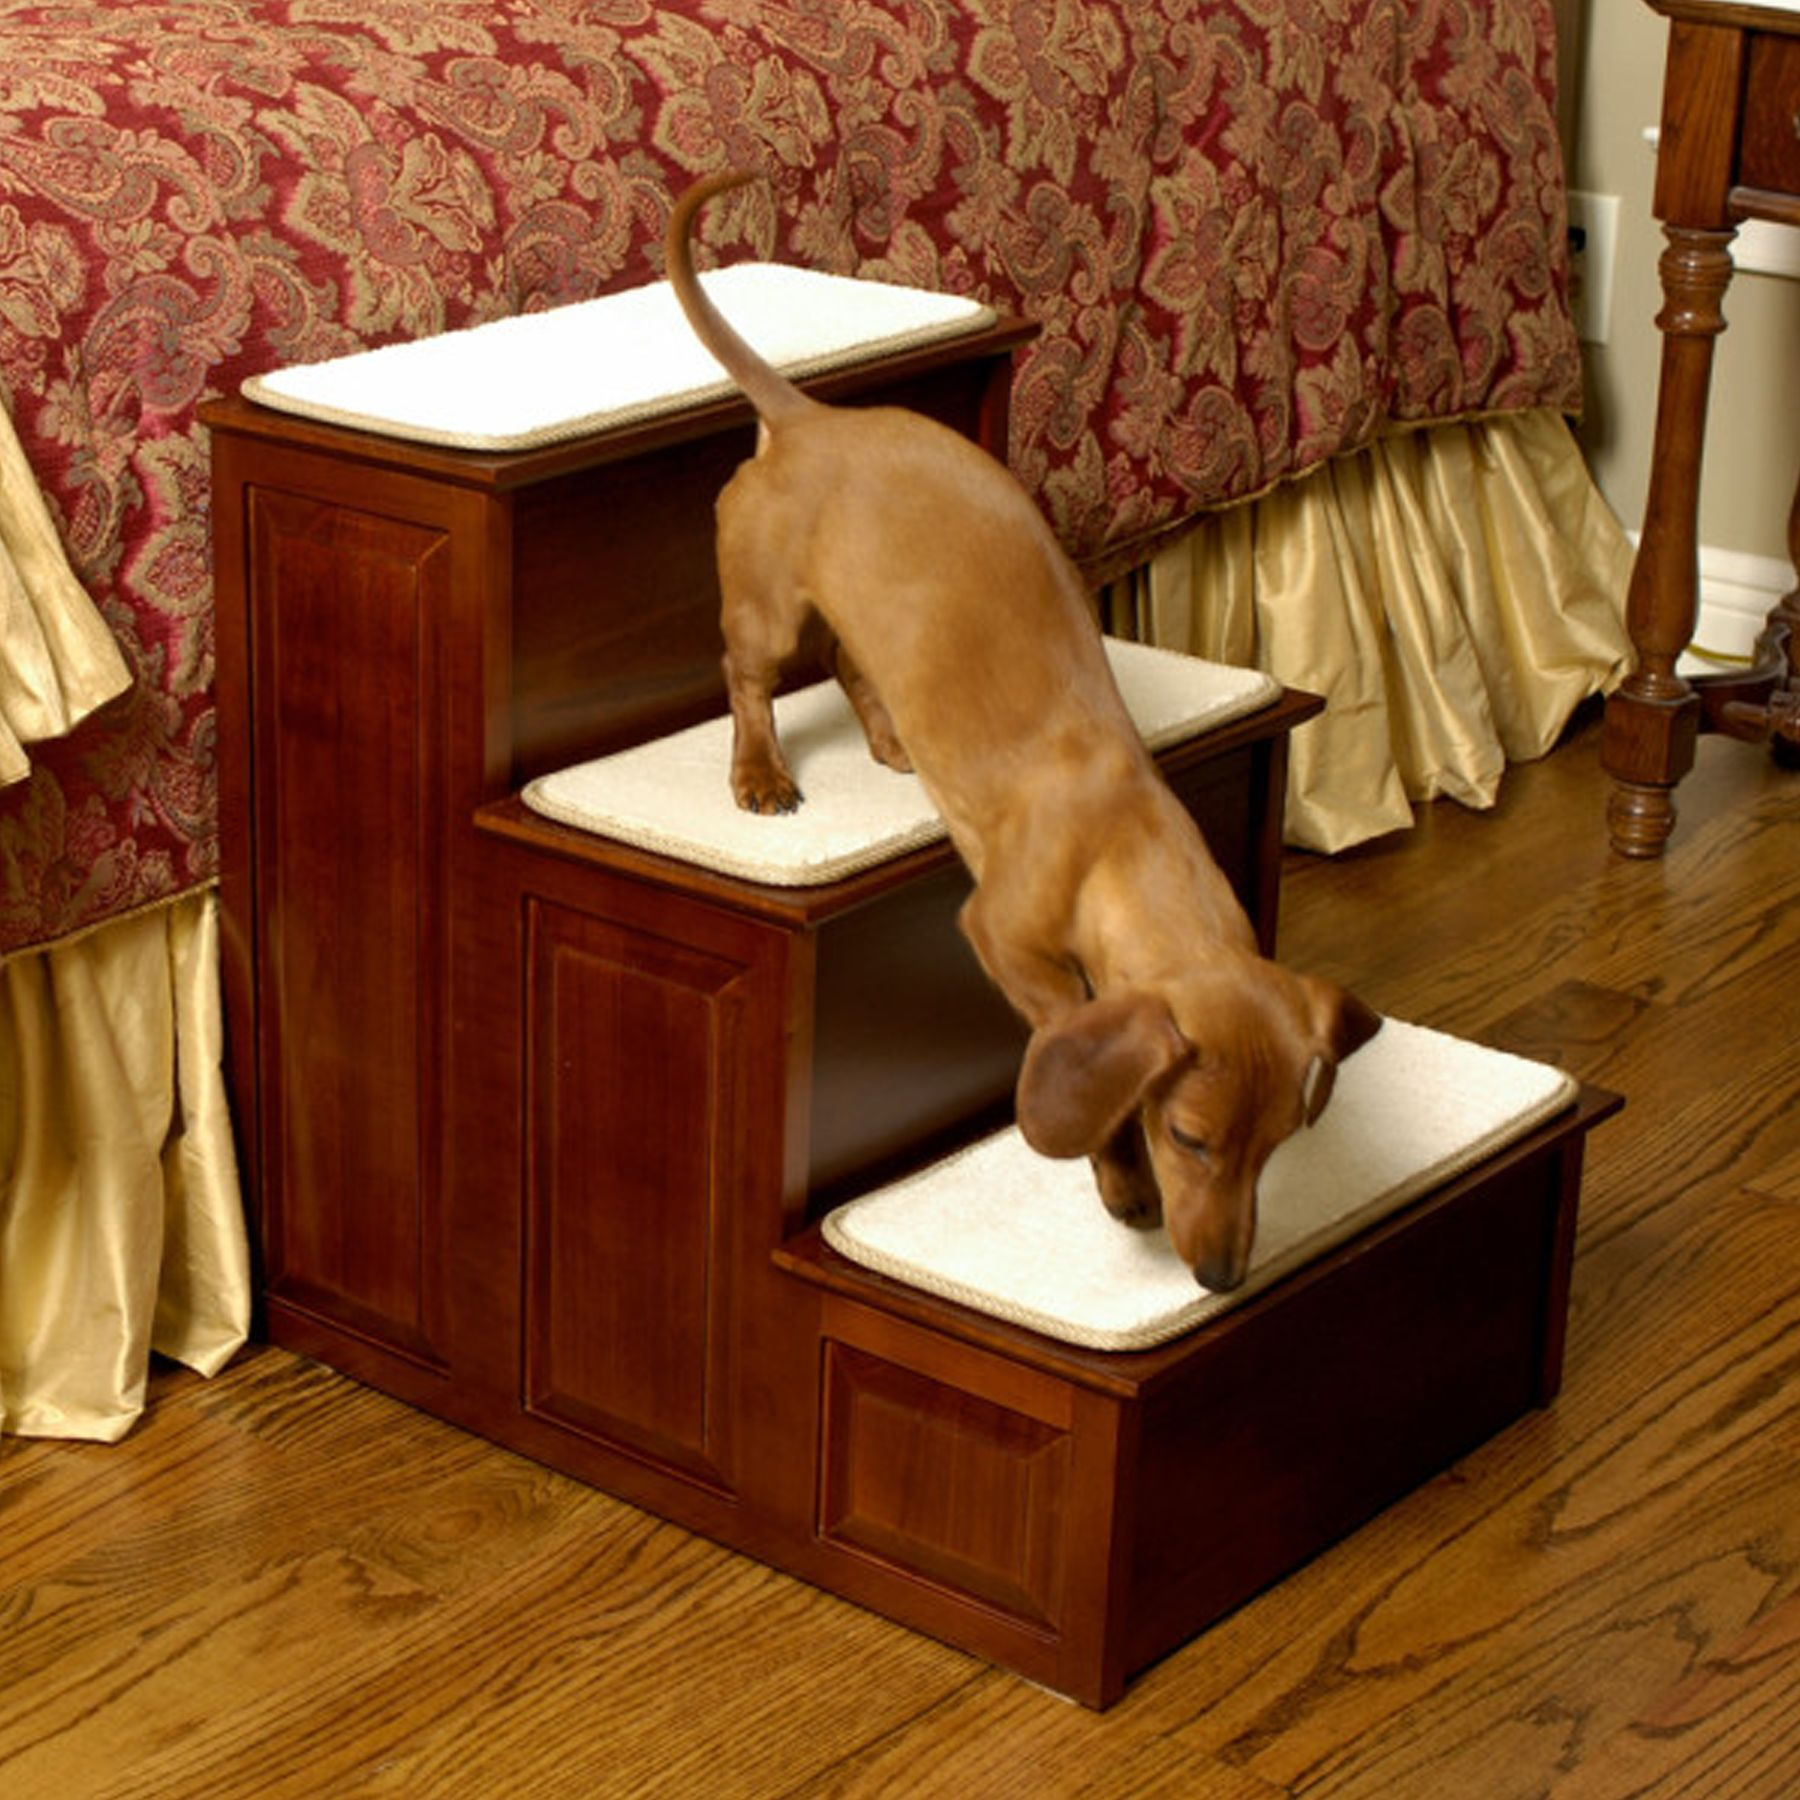 Mr. Herzhers Decorative 3 Step Pet Step Size 16l X 18w X 21h Red Mr. Herzhers